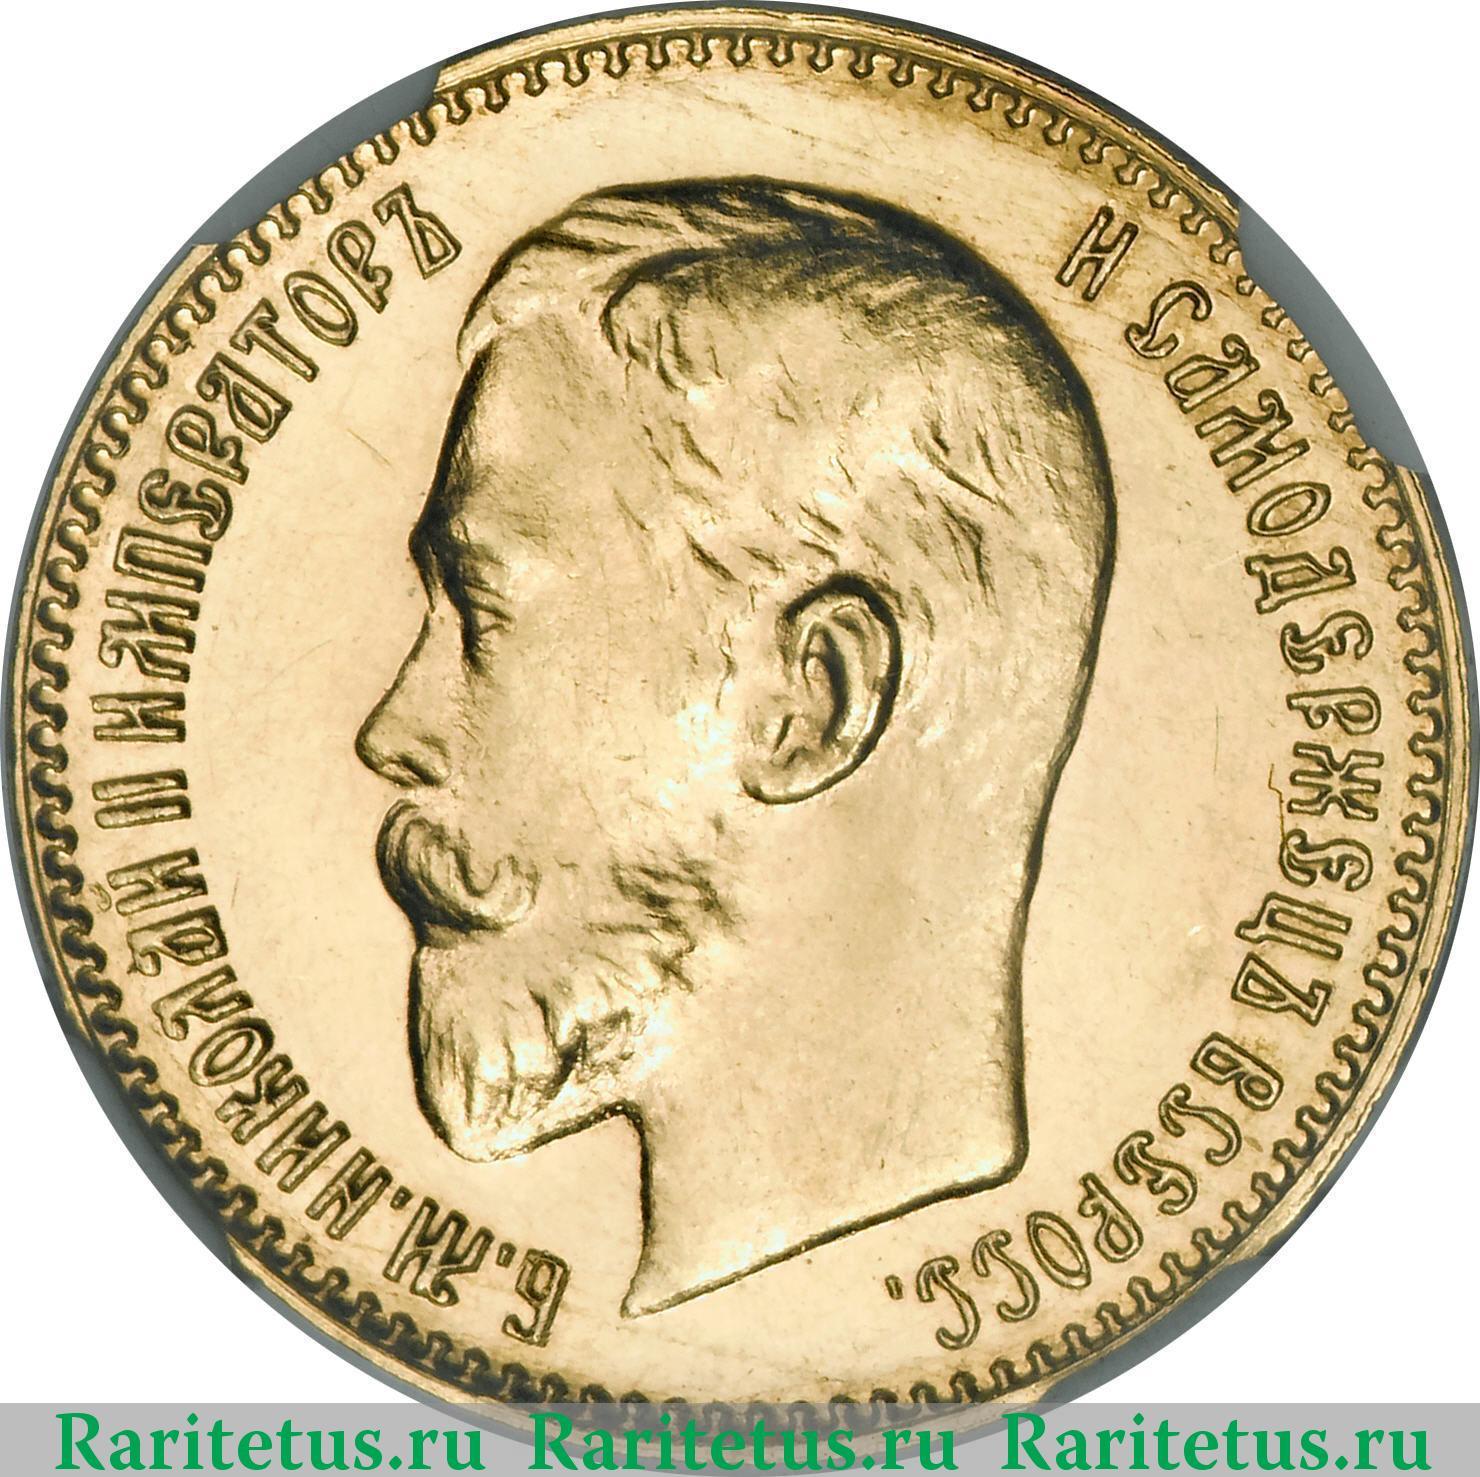 2 krooni 1930 цена